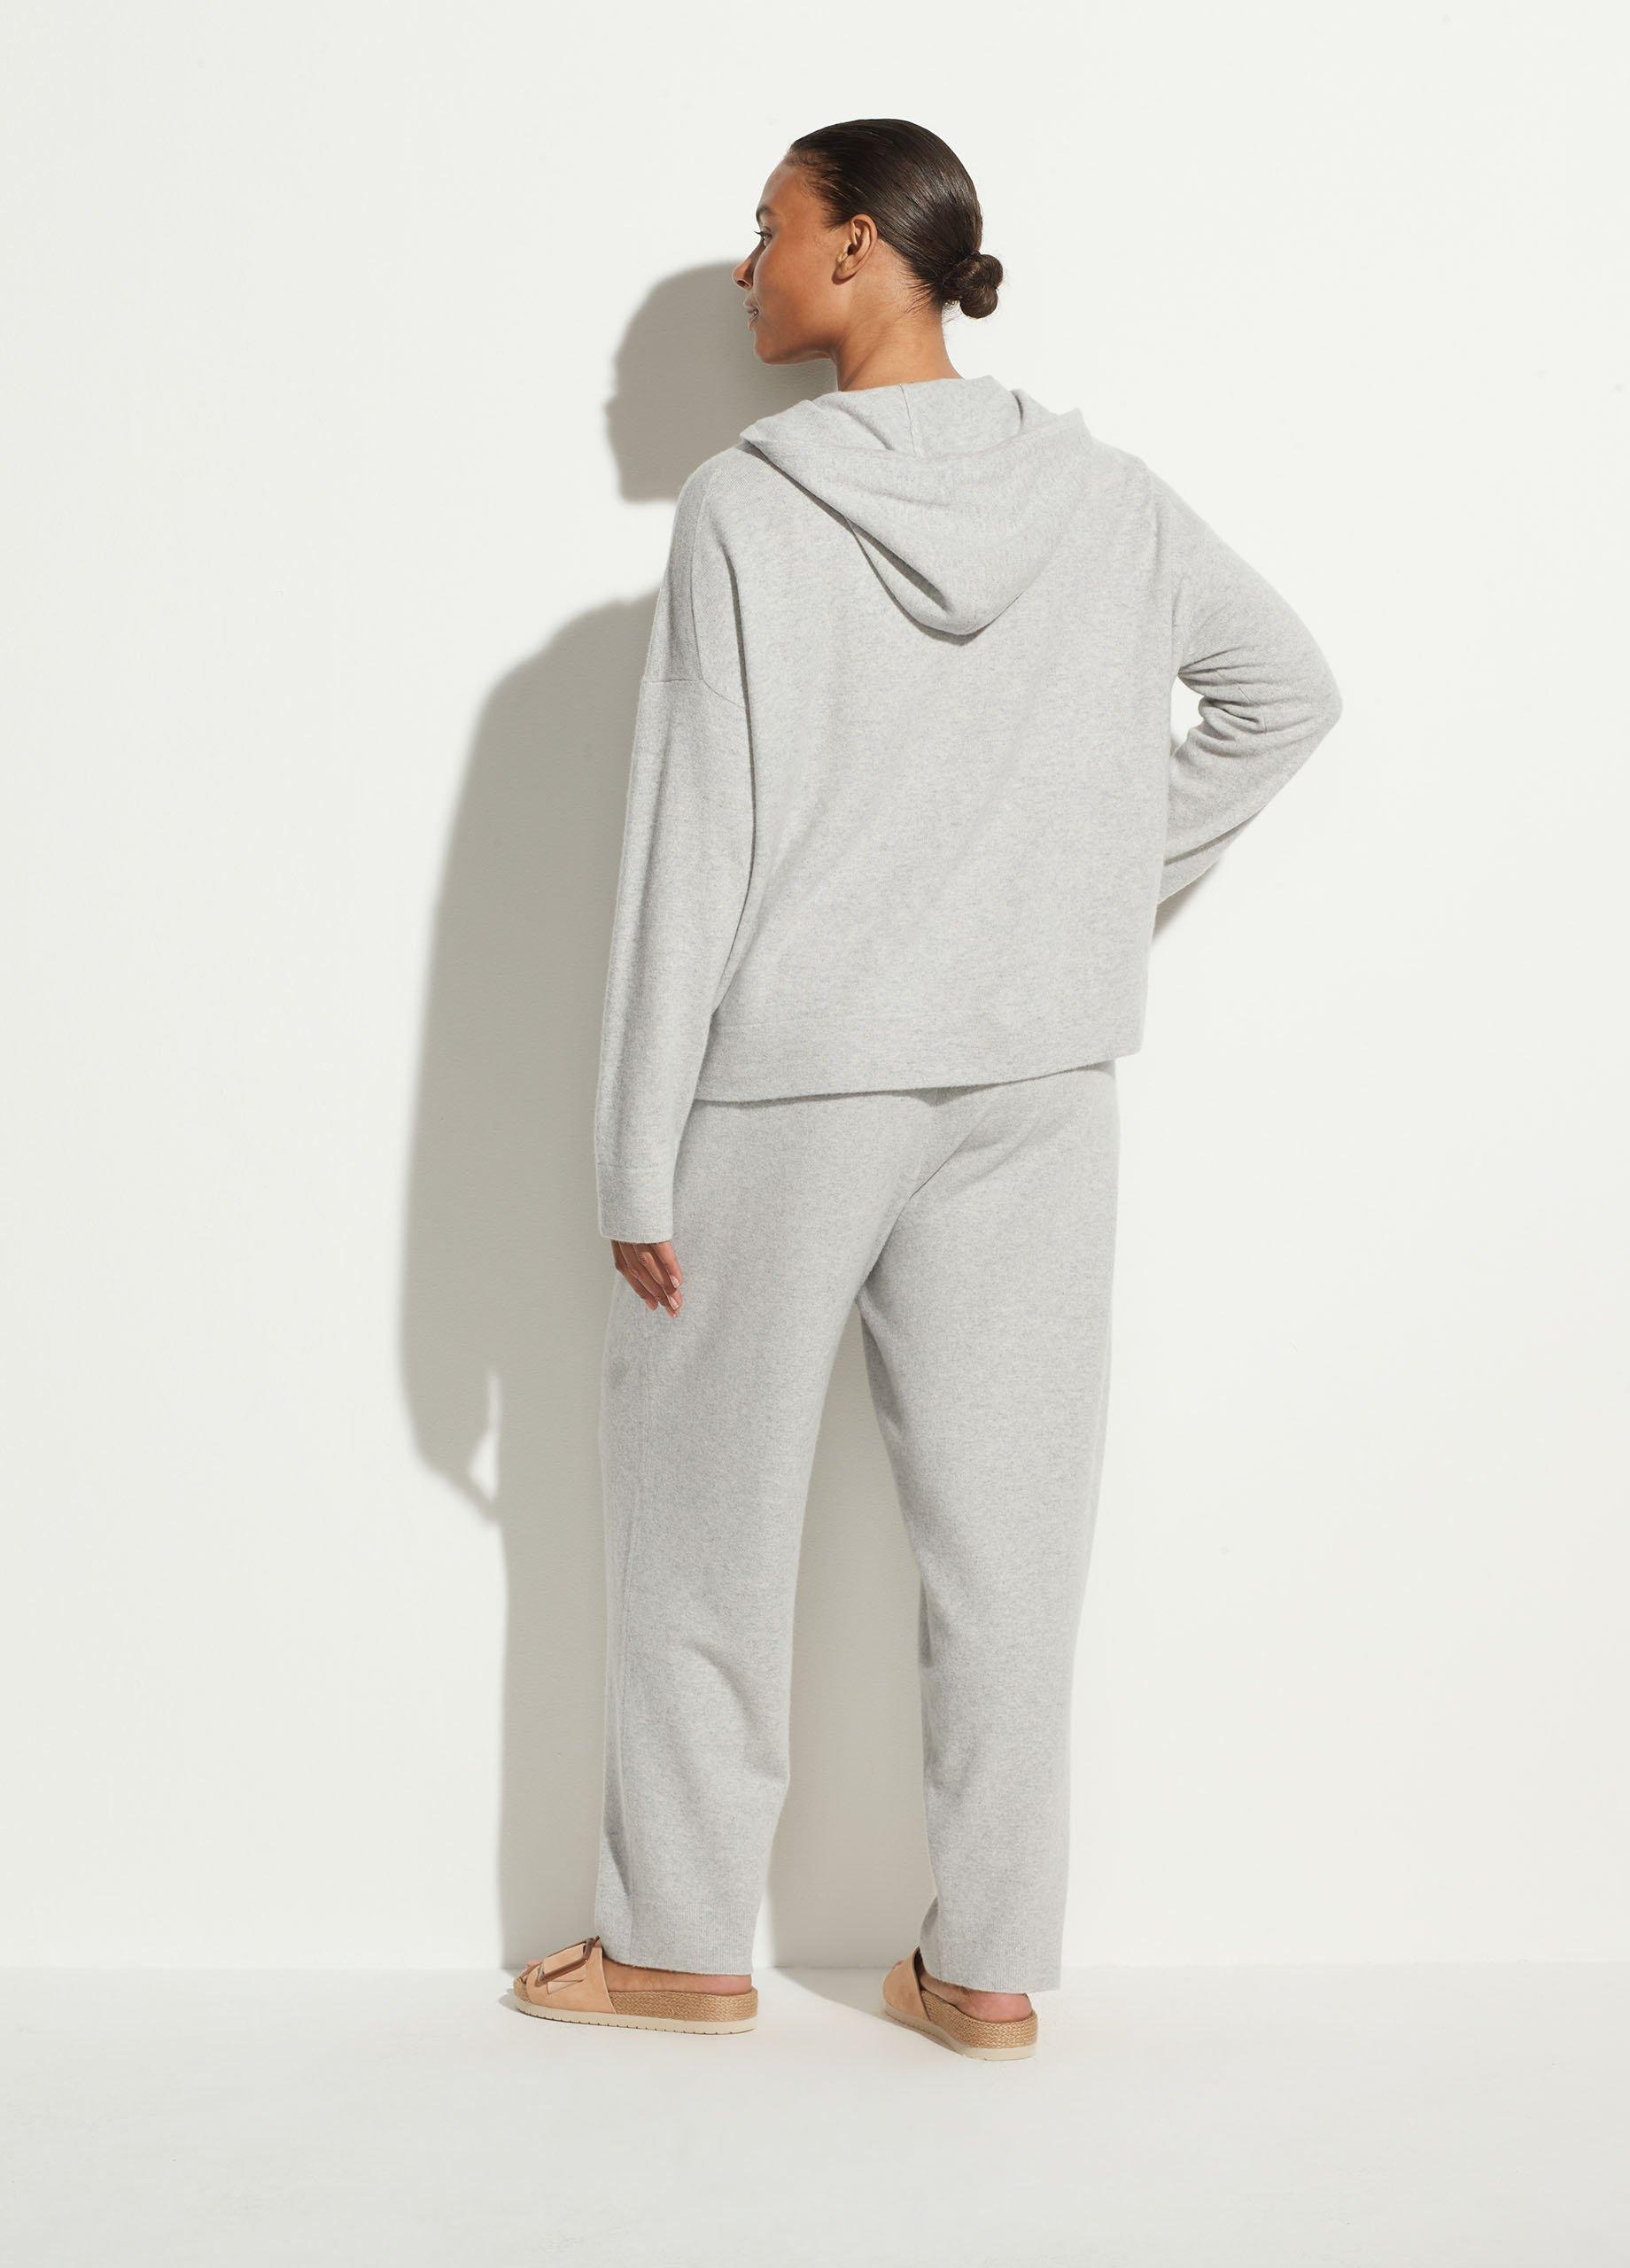 Wool Cashmere Zip Up Hoodie